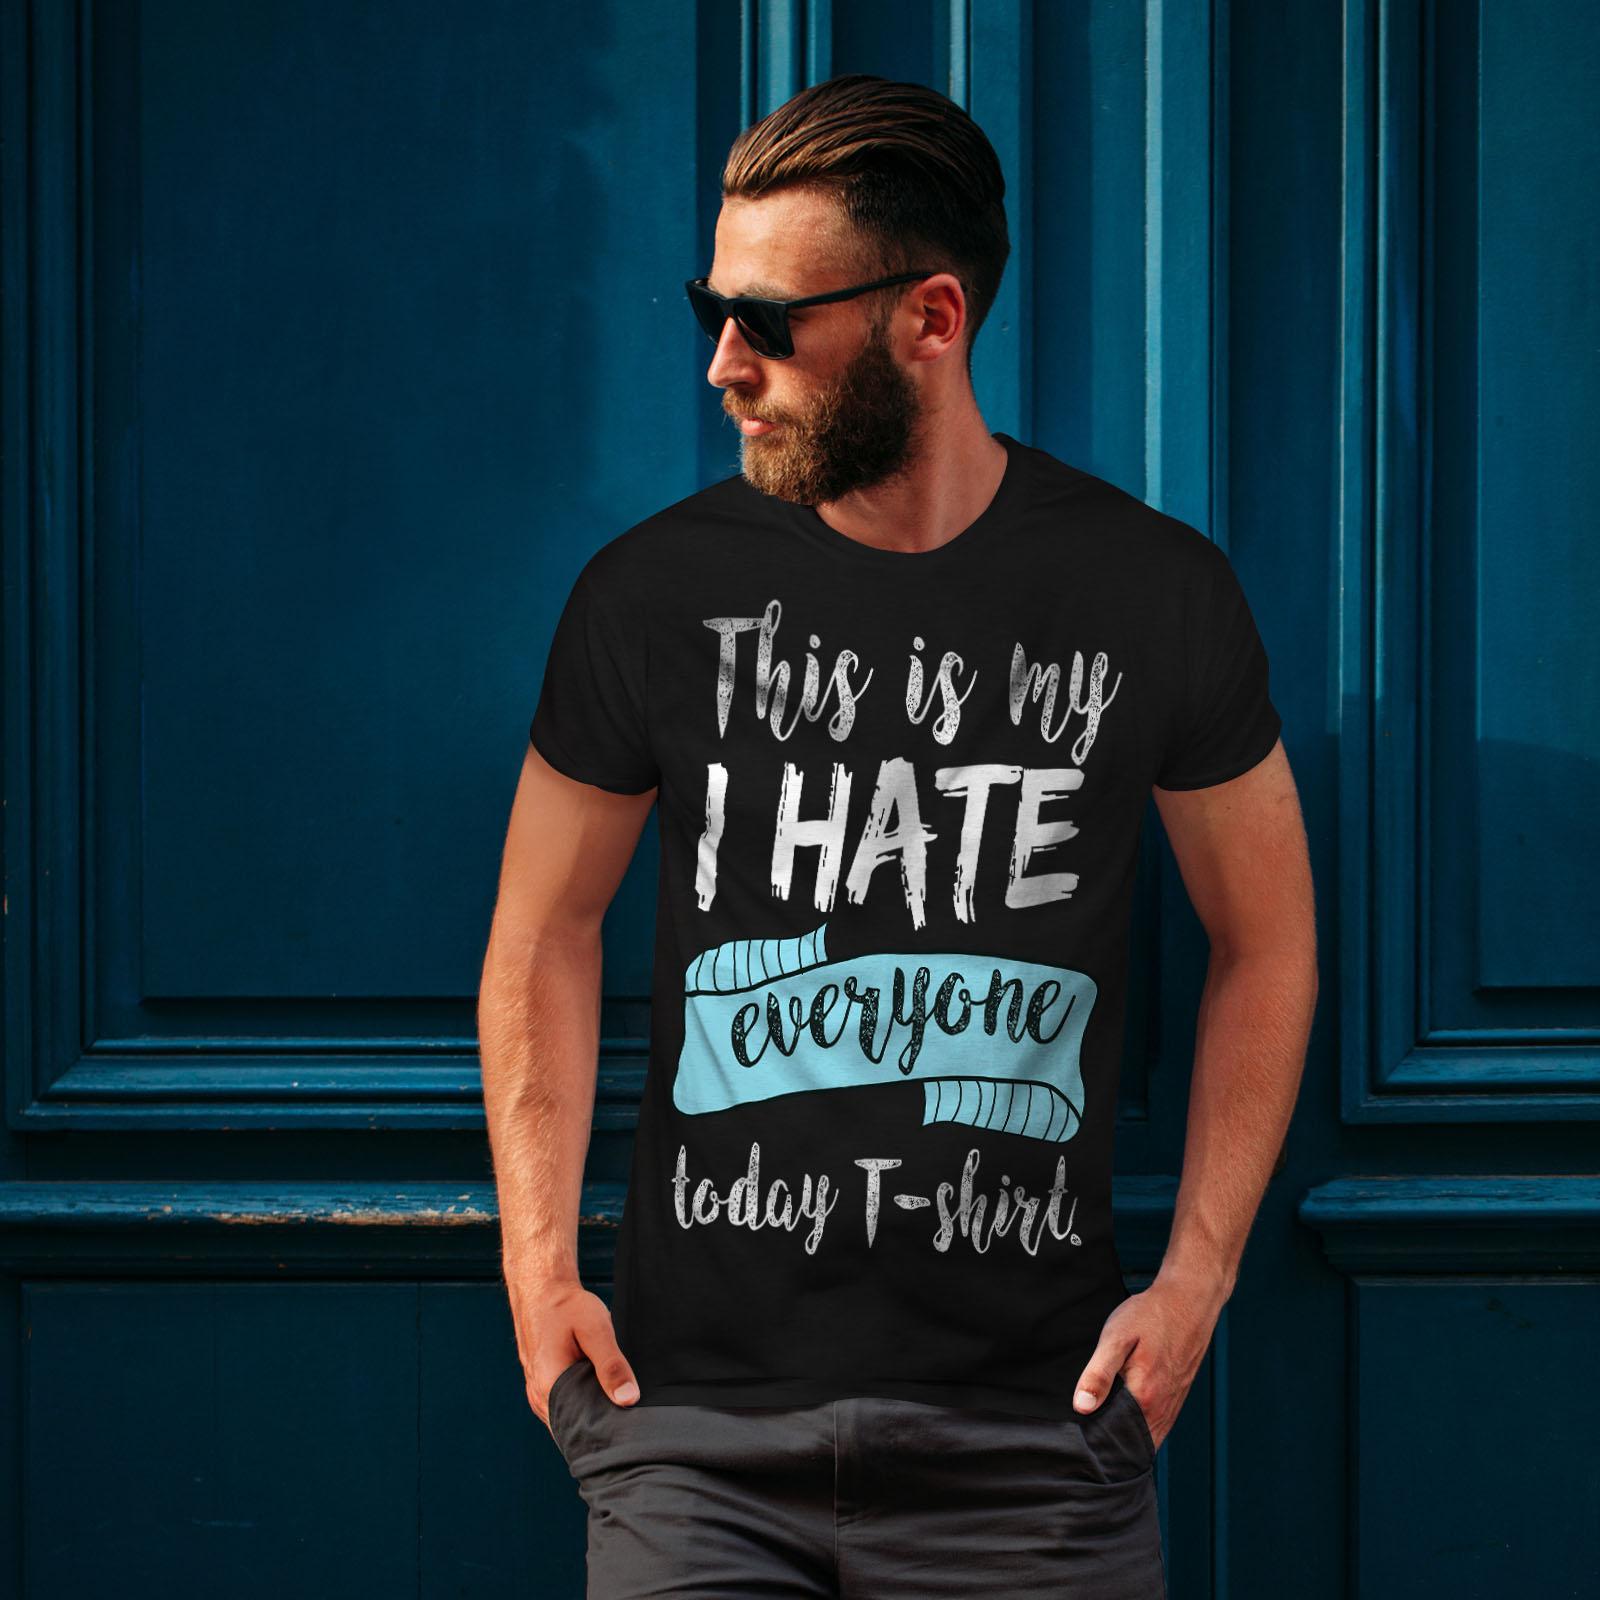 Wellcoda-hasse-alle-heute-Herren-T-Shirt-lustige-Grafikdesign-Printed-Tee Indexbild 4